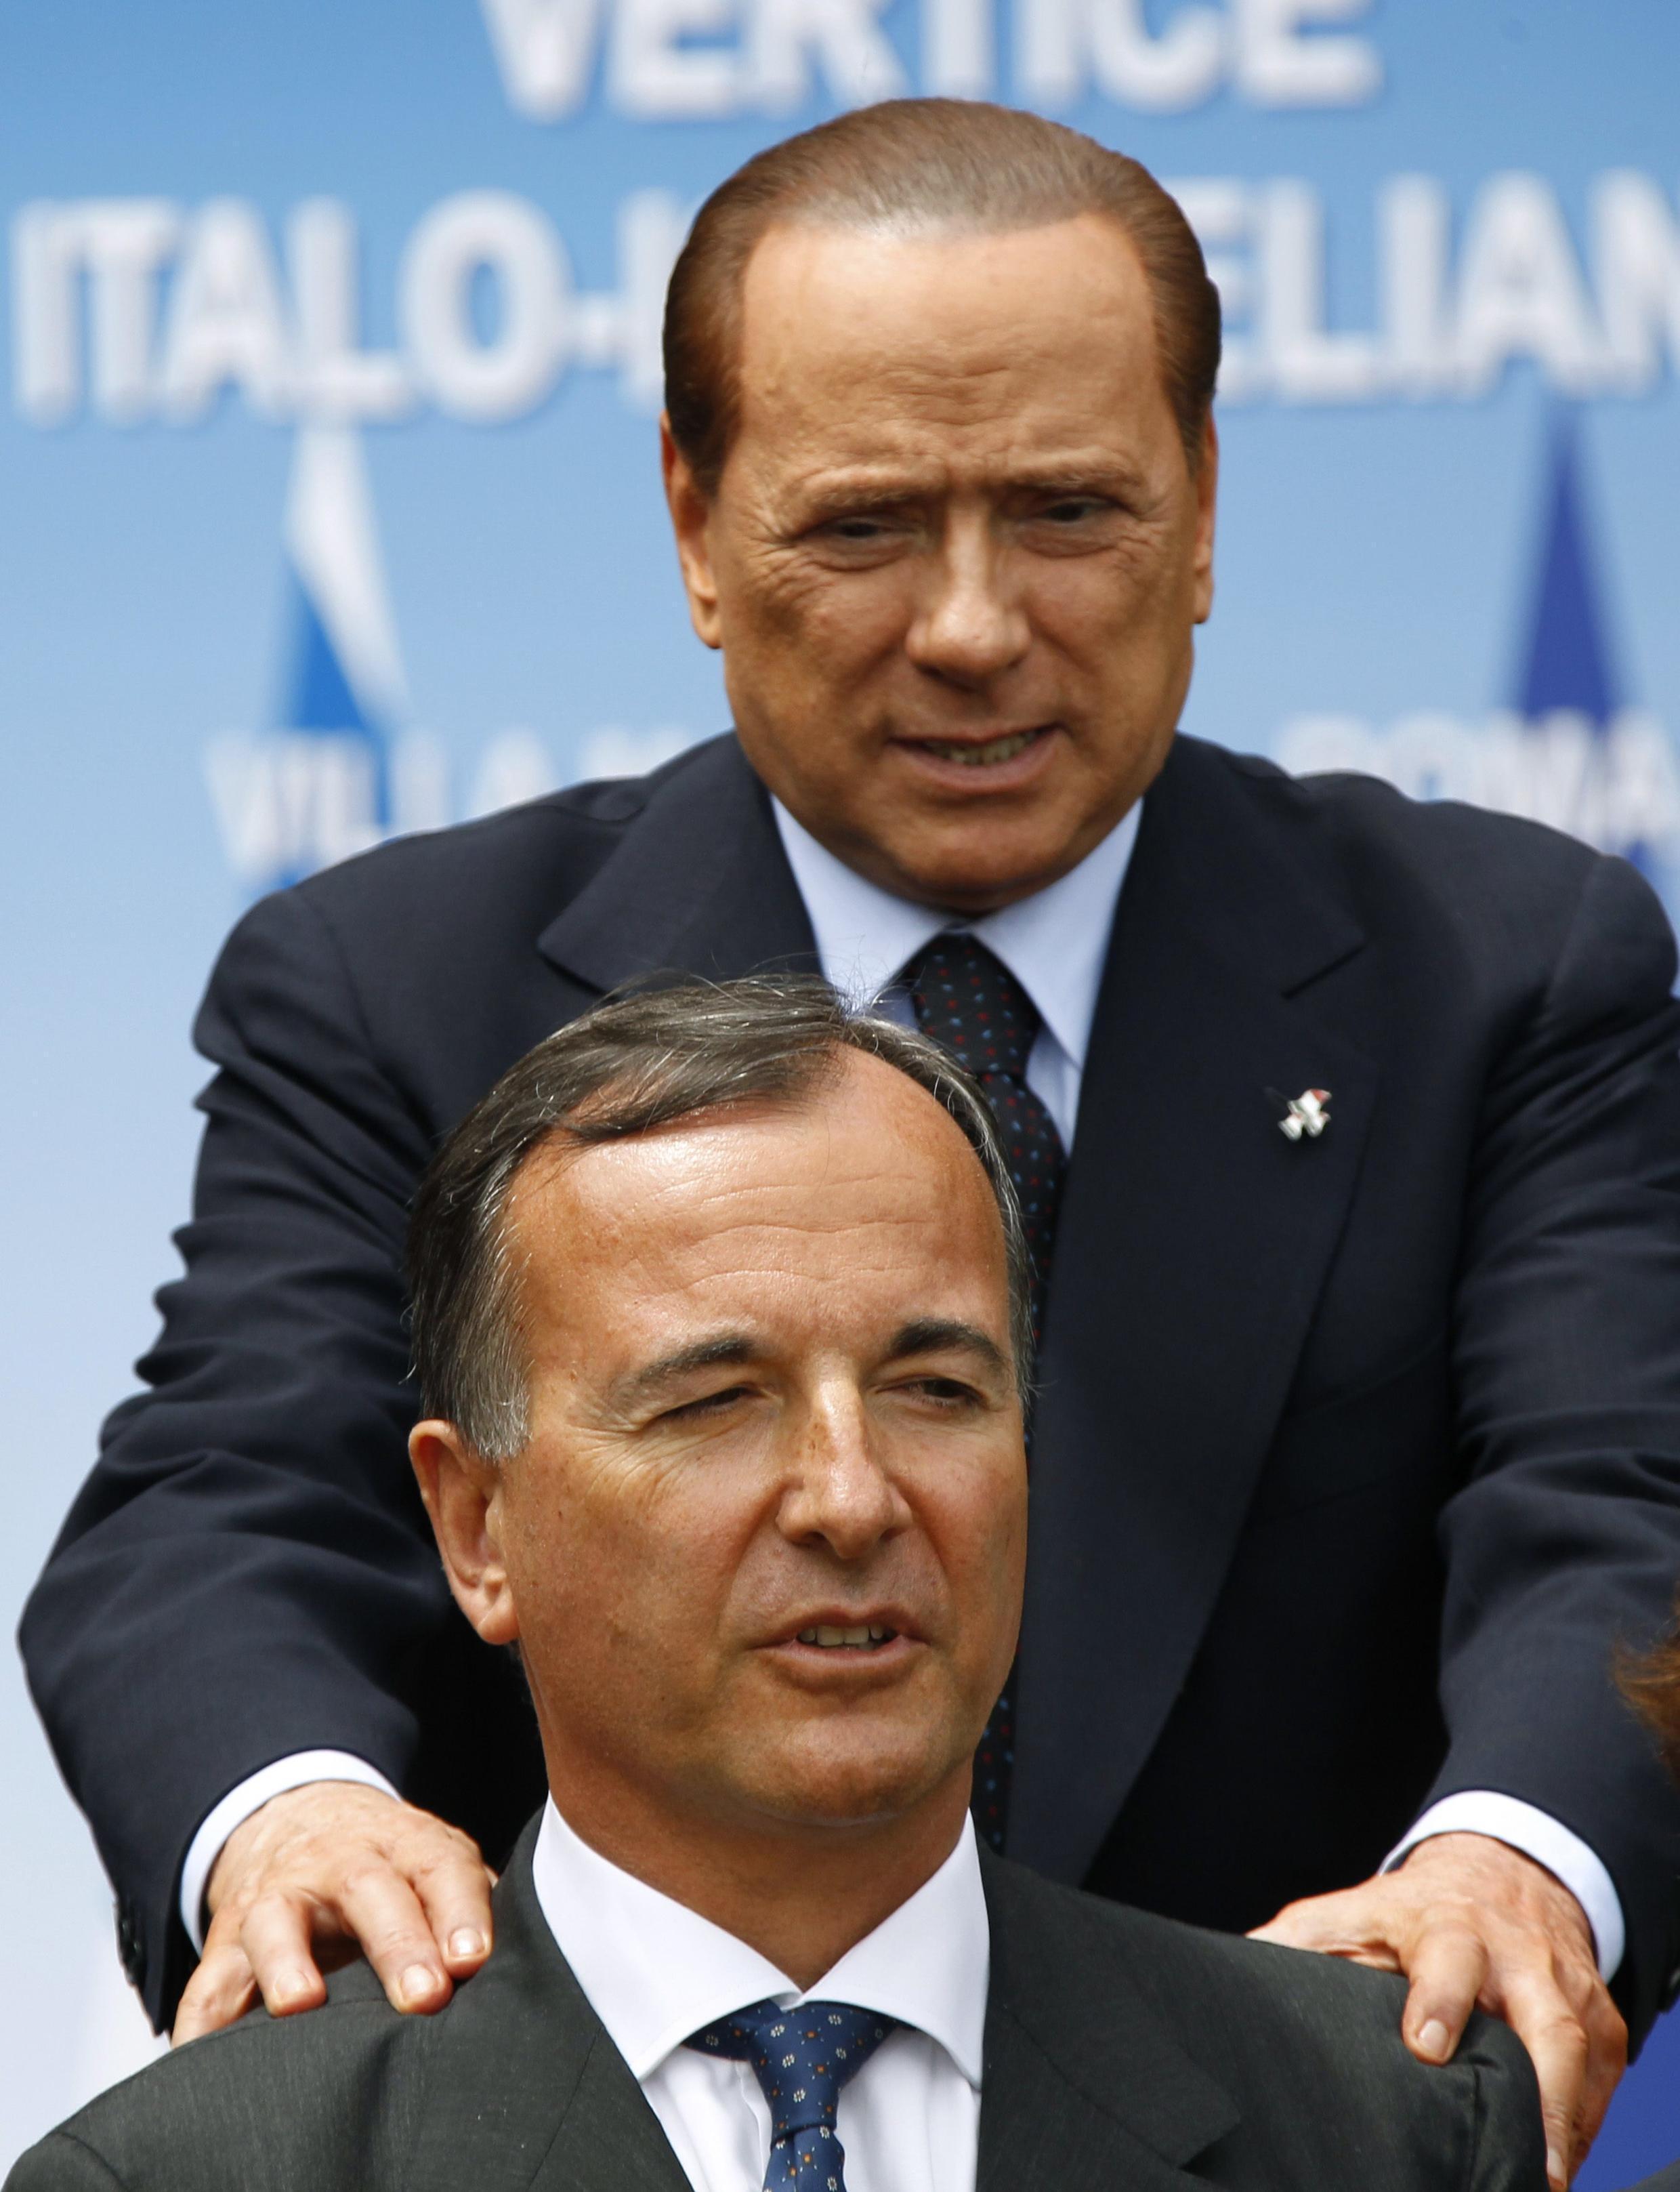 O ministro italiano das Relações Exteriores, Franco Frattini, e o primeiro-ministro italiano, Silvio Berlusconi.